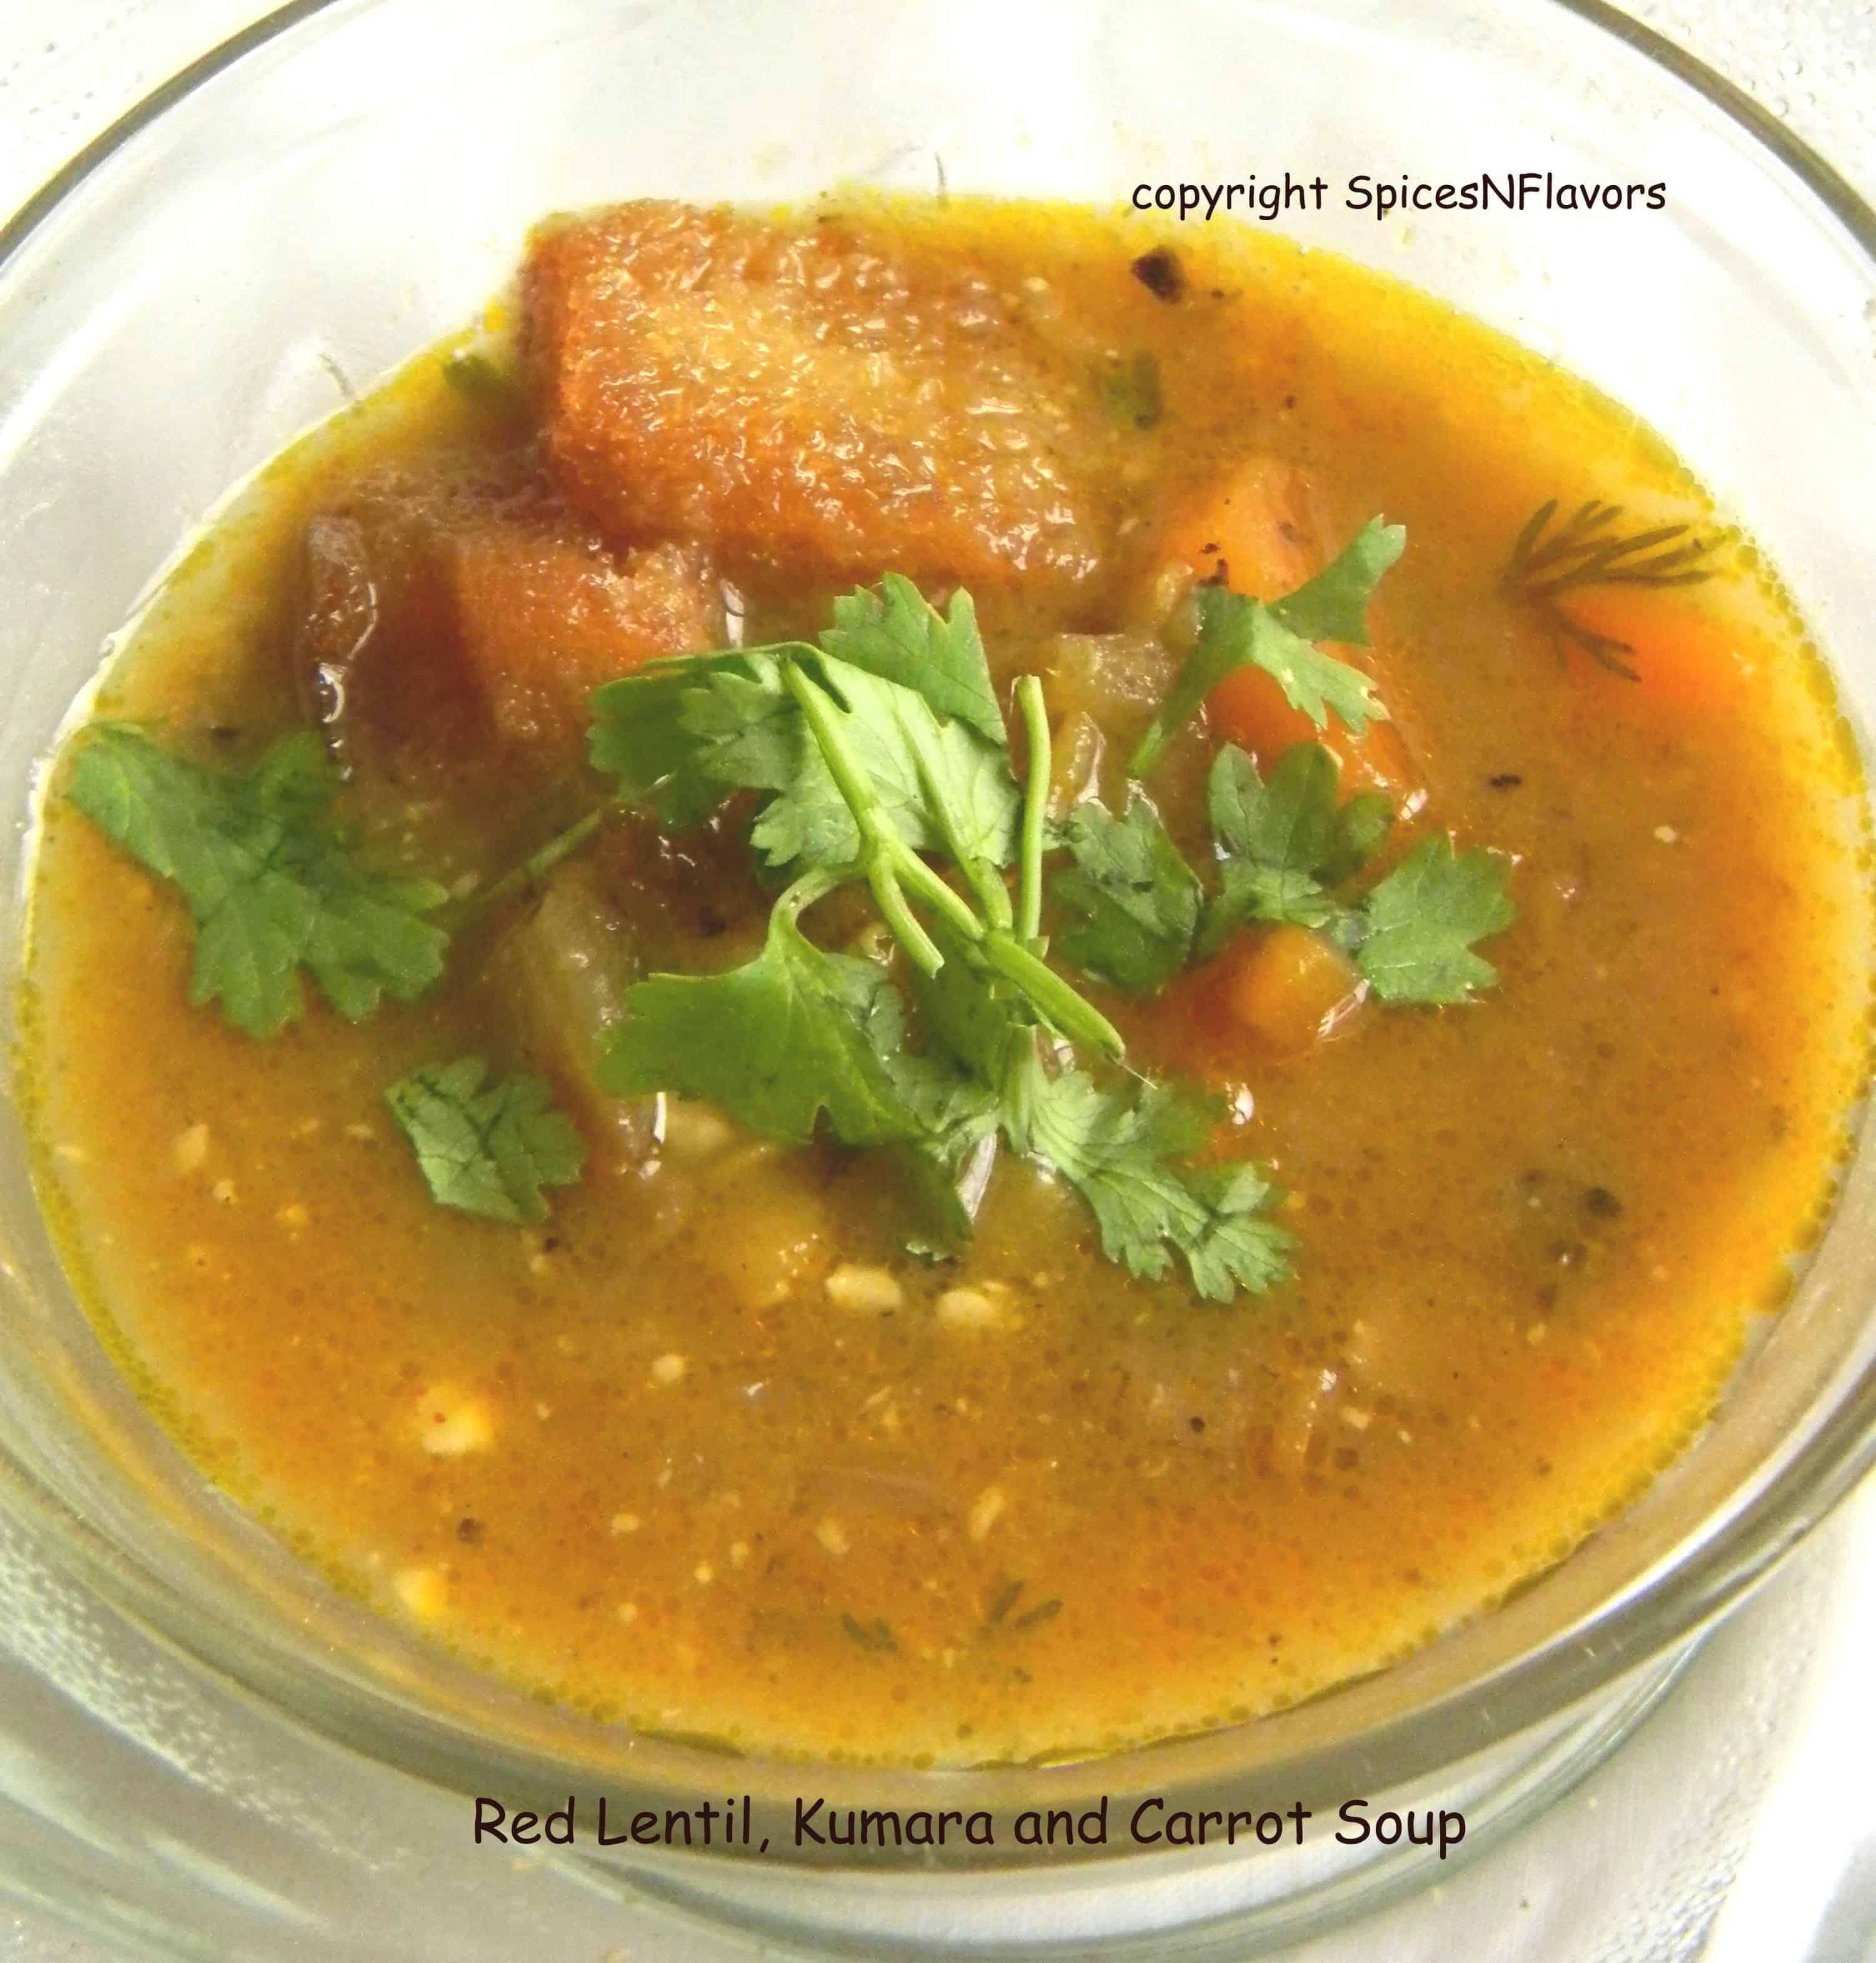 red-lentil-kumara-carrot-soup-spicesnflavors.com